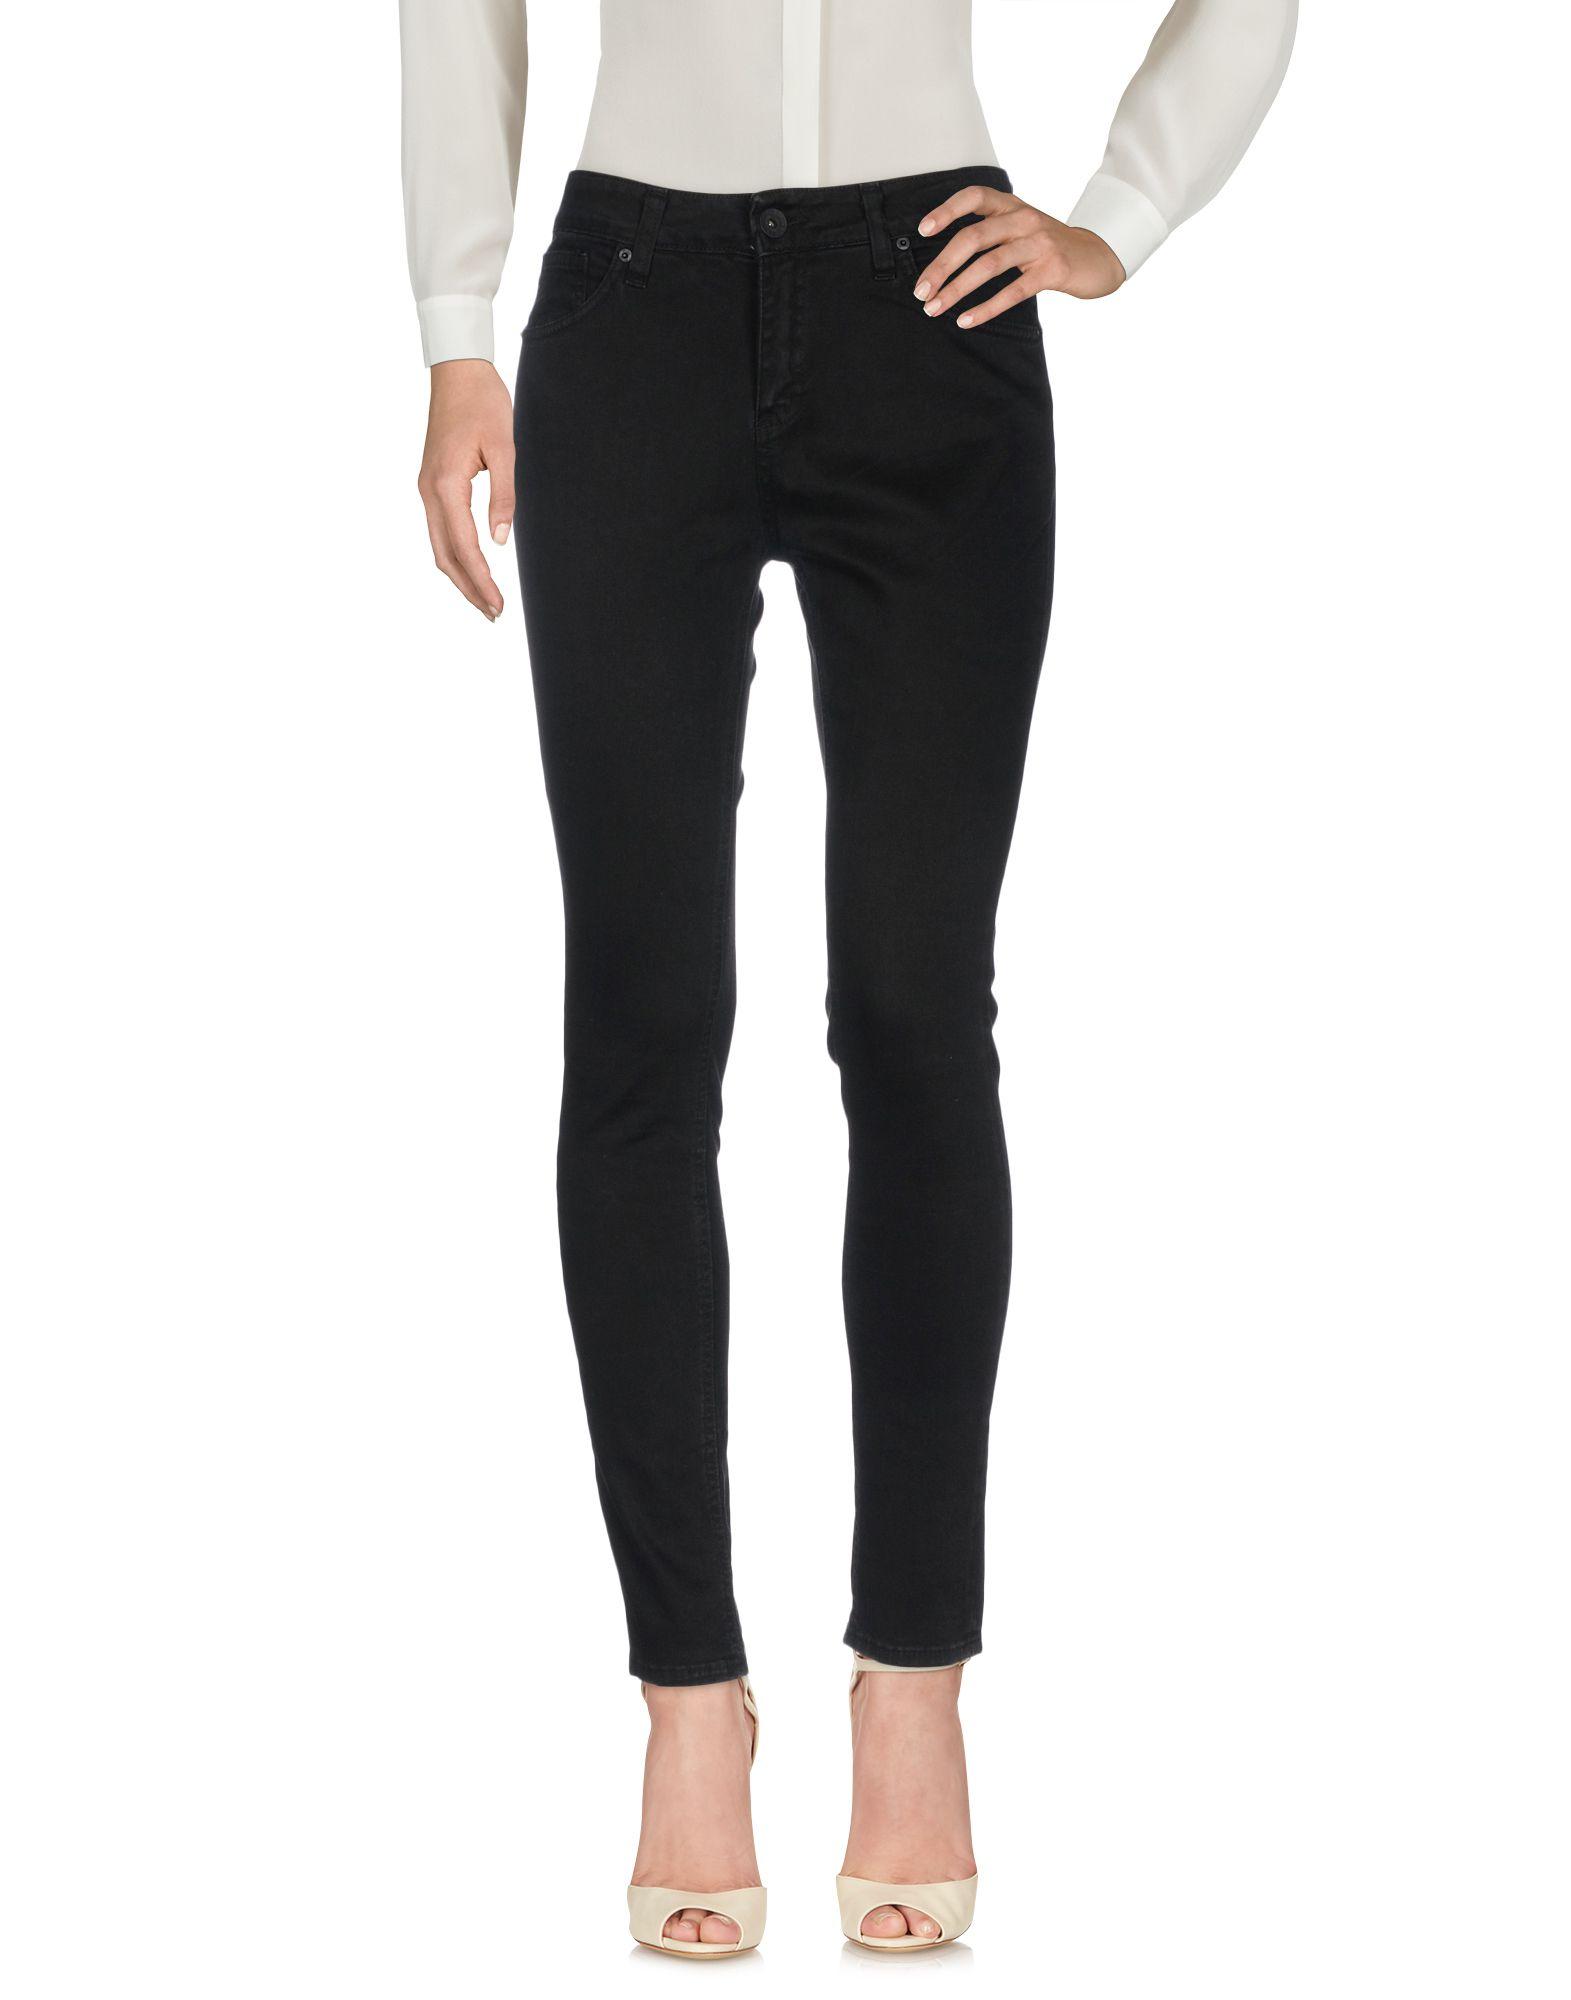 цена MISS MISS by VALENTINA Повседневные брюки онлайн в 2017 году